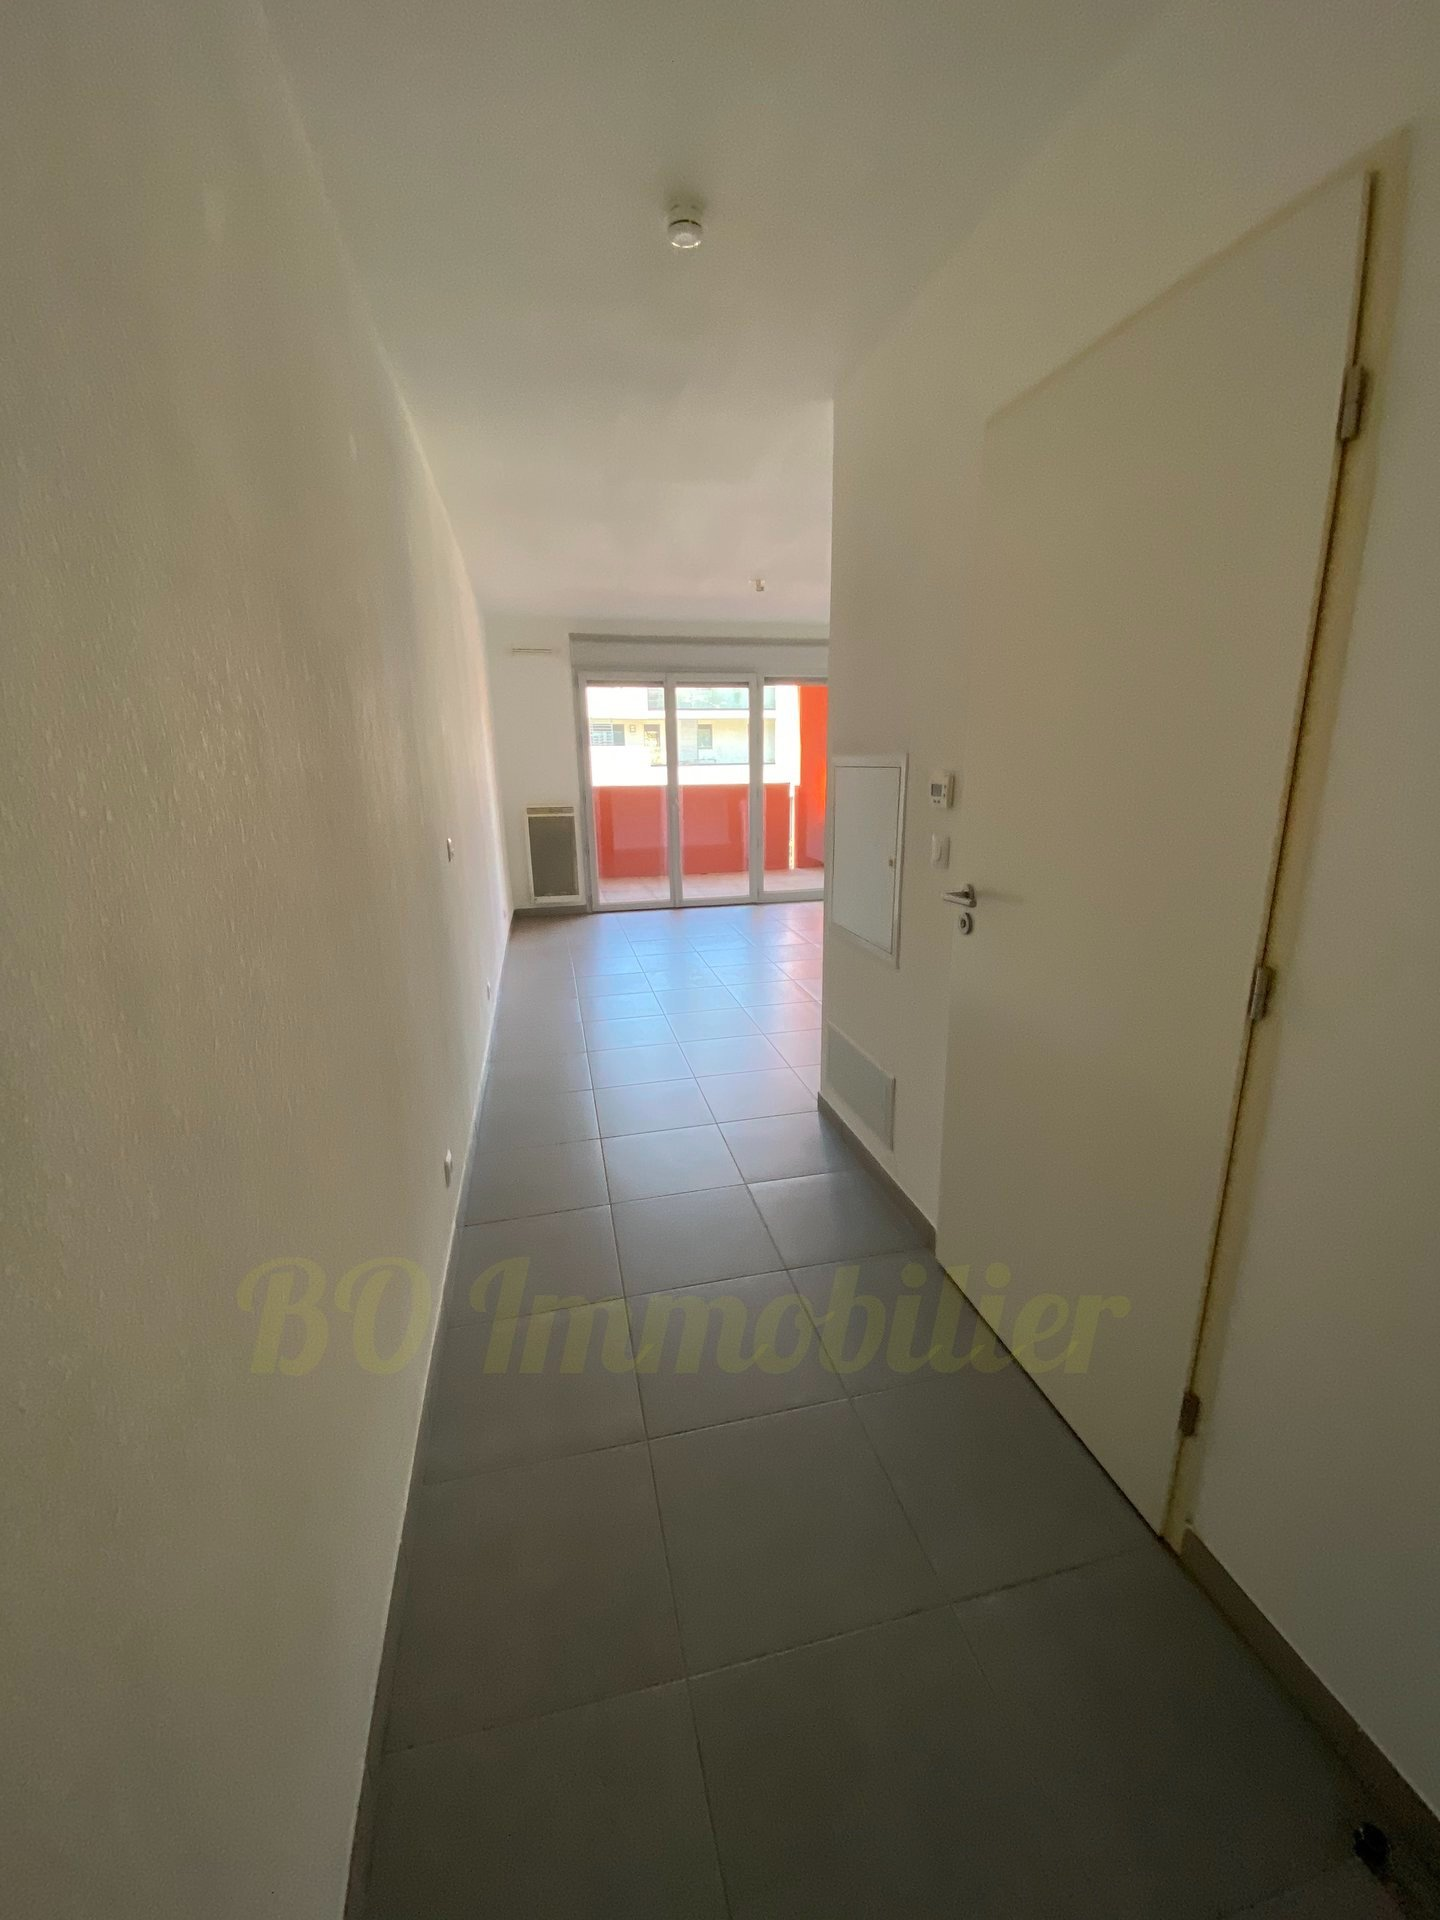 Studio de 26.40m² + terrasse de 6.90m² + 1 parking